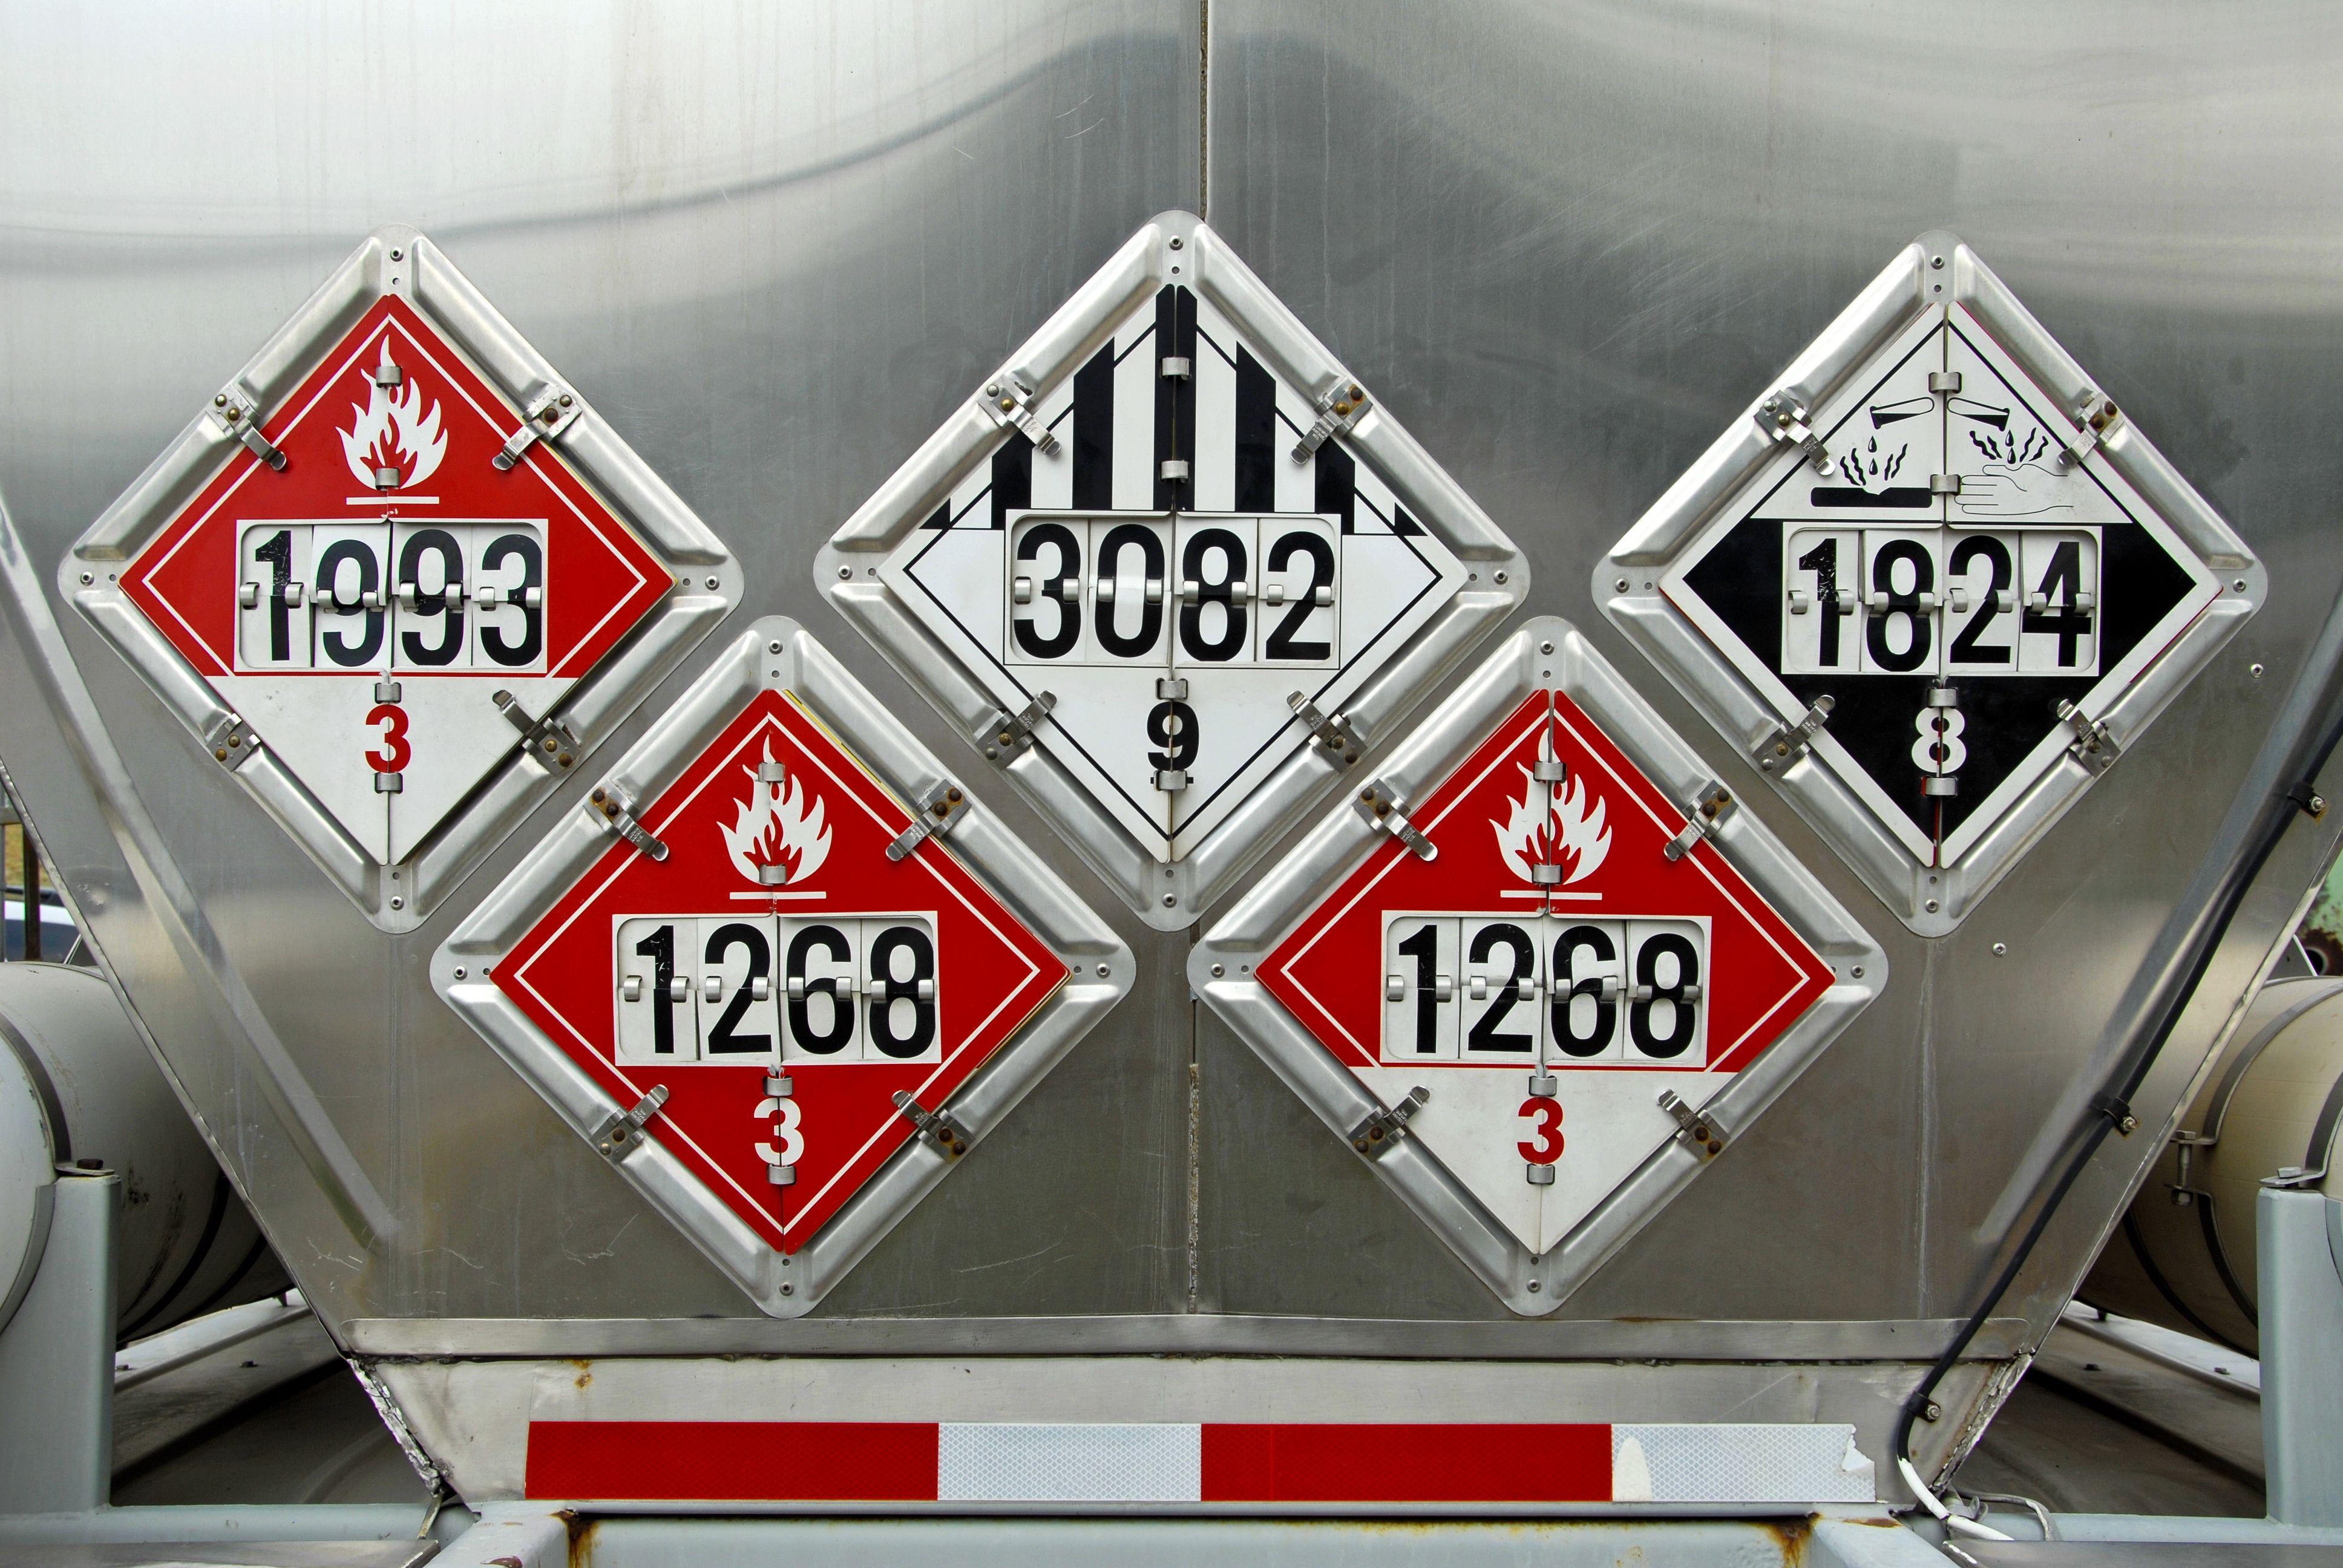 Hazardous material, class 1 Div 2 solutions